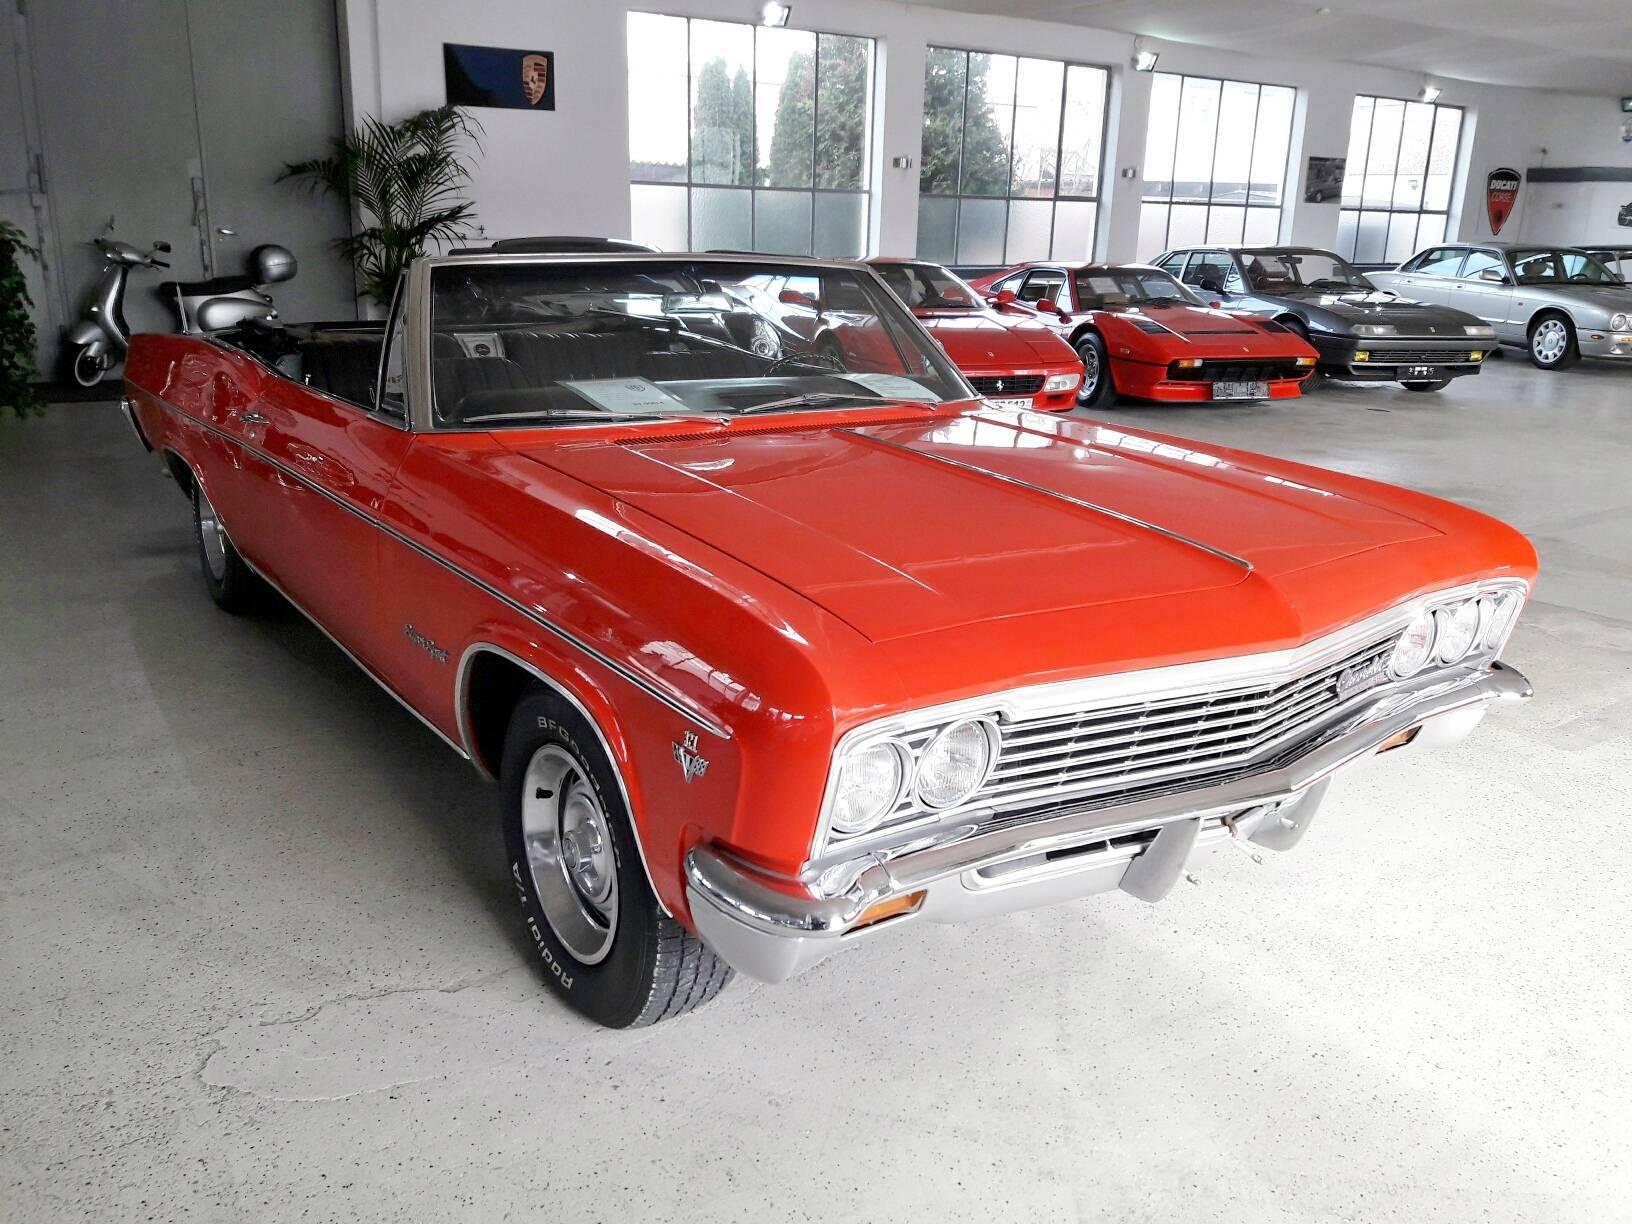 chevrolet impala convertible 1966 f r eur kaufen. Black Bedroom Furniture Sets. Home Design Ideas